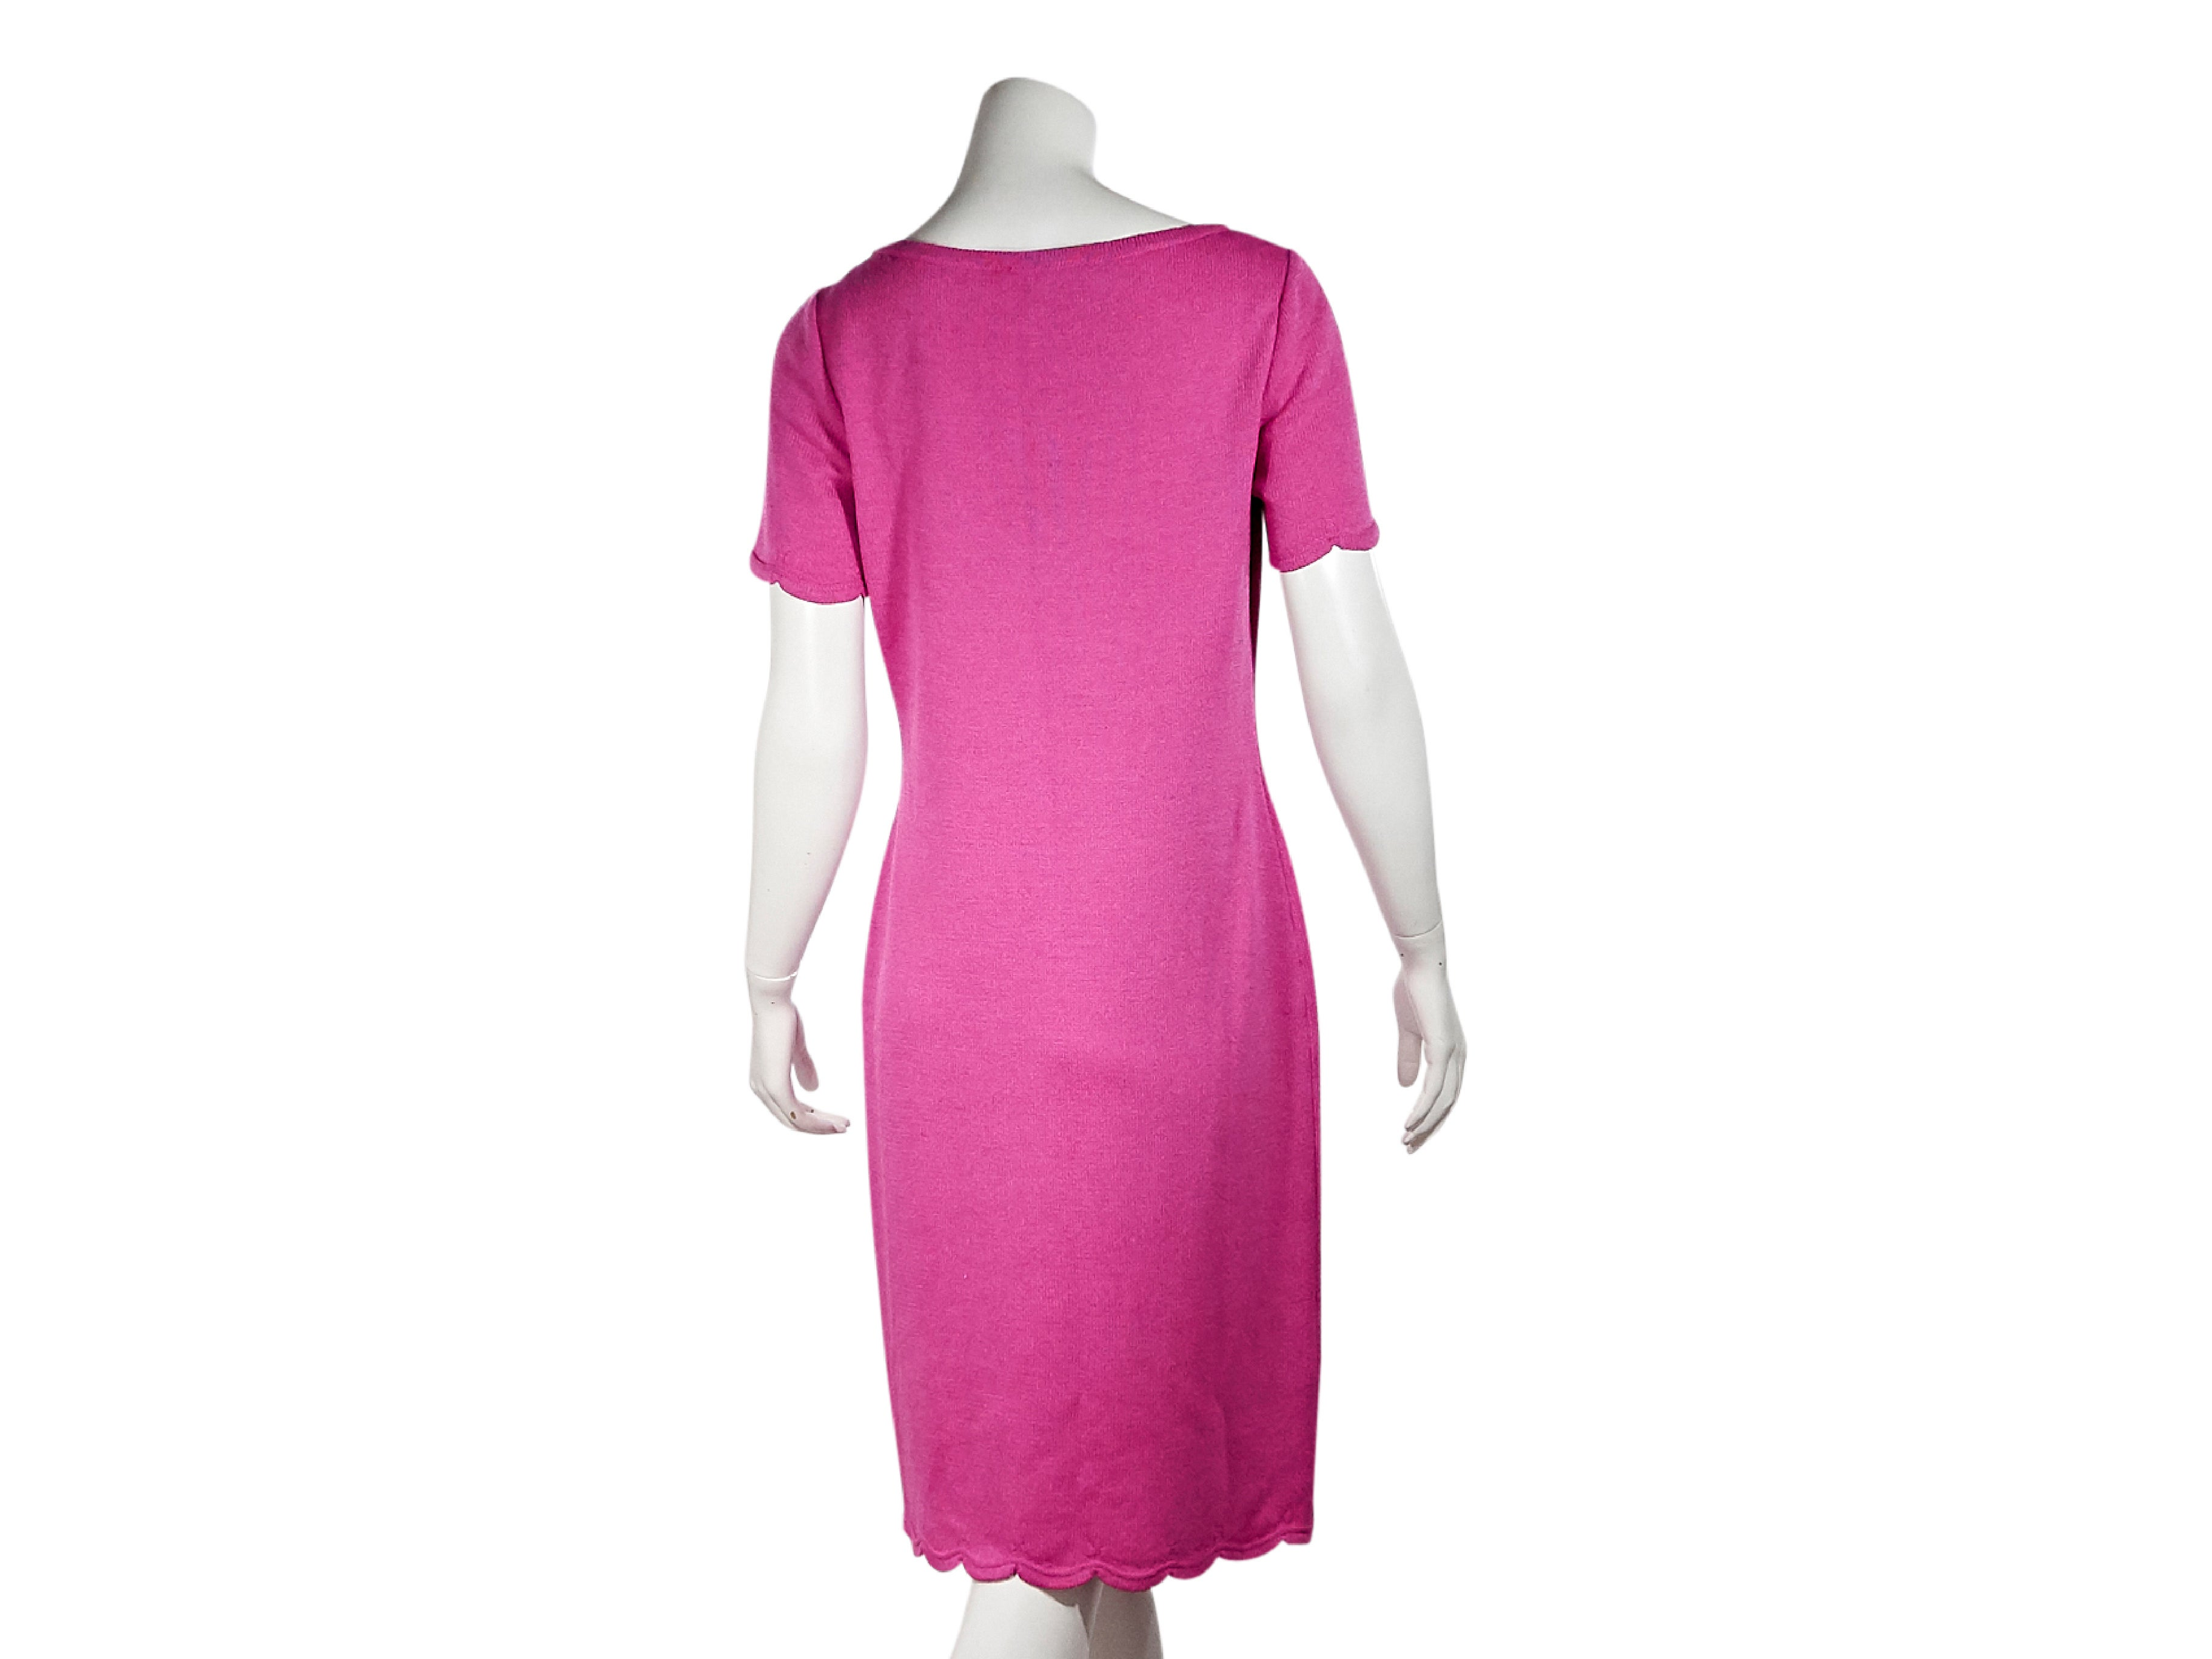 Pink St John Knit T Shirt Dress For Sale At 1stdibs